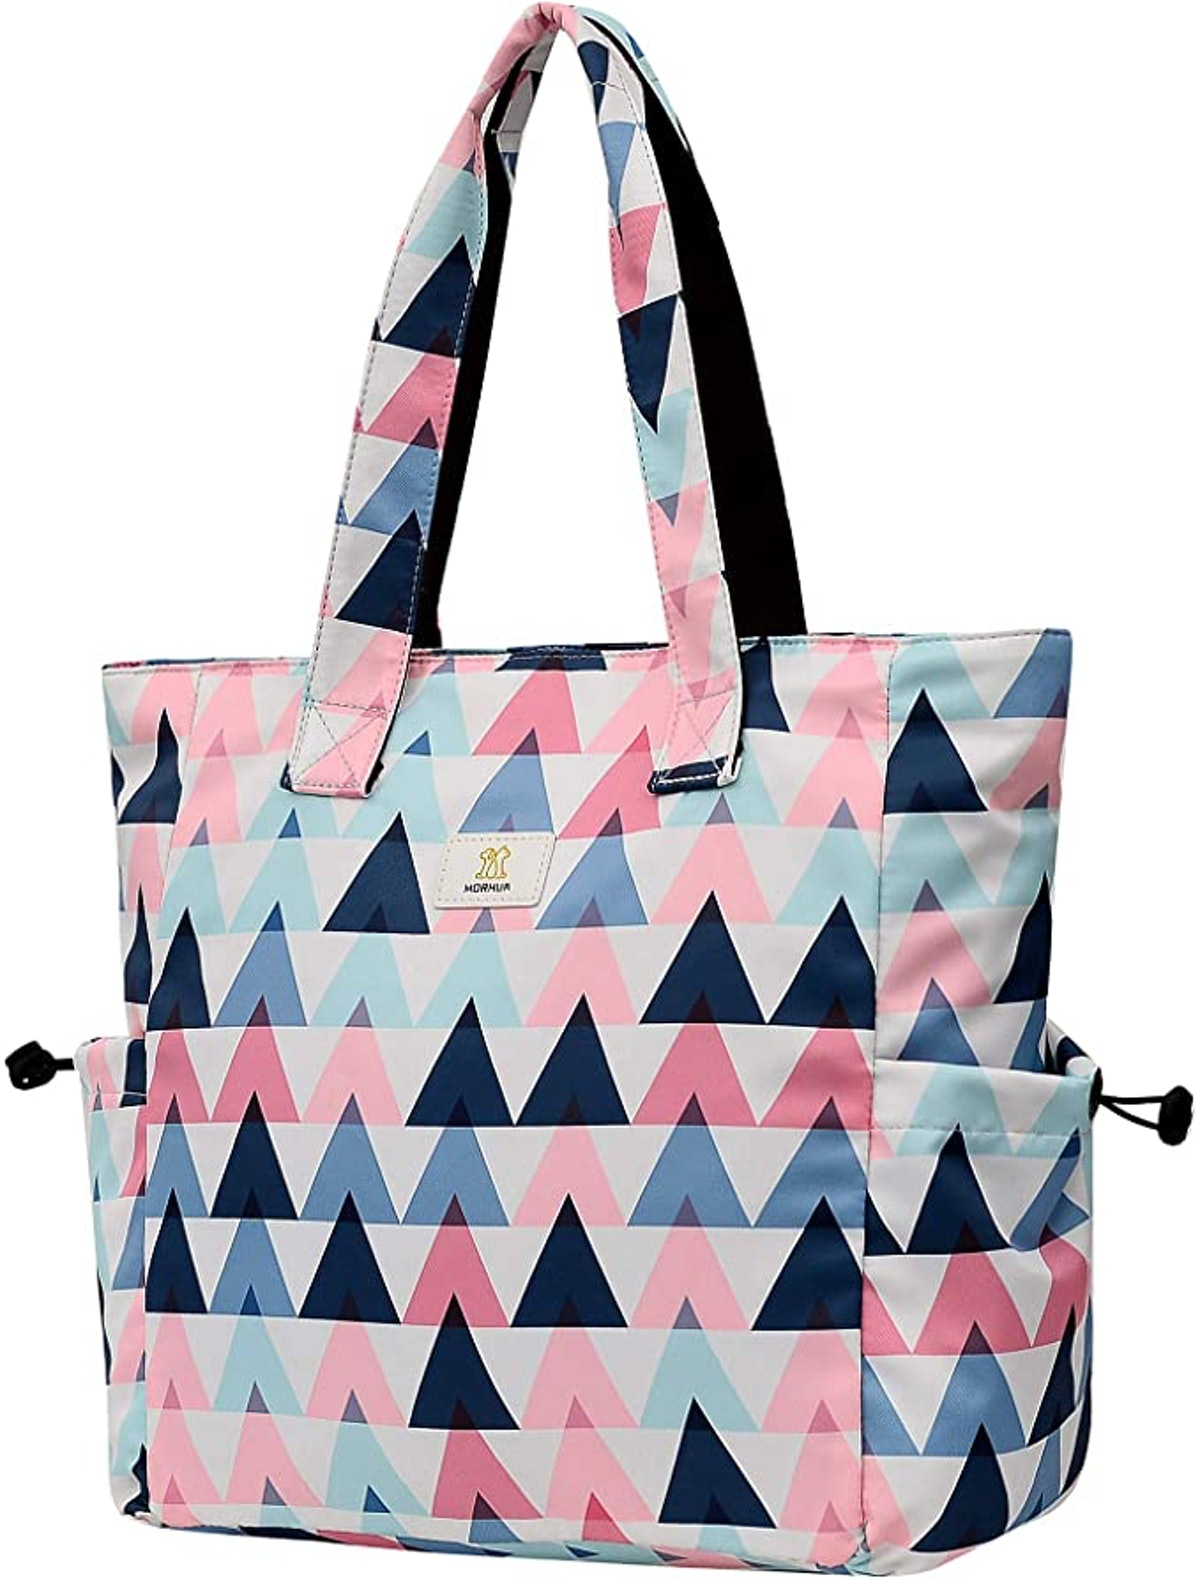 Morhua Lightweight Tote Bag